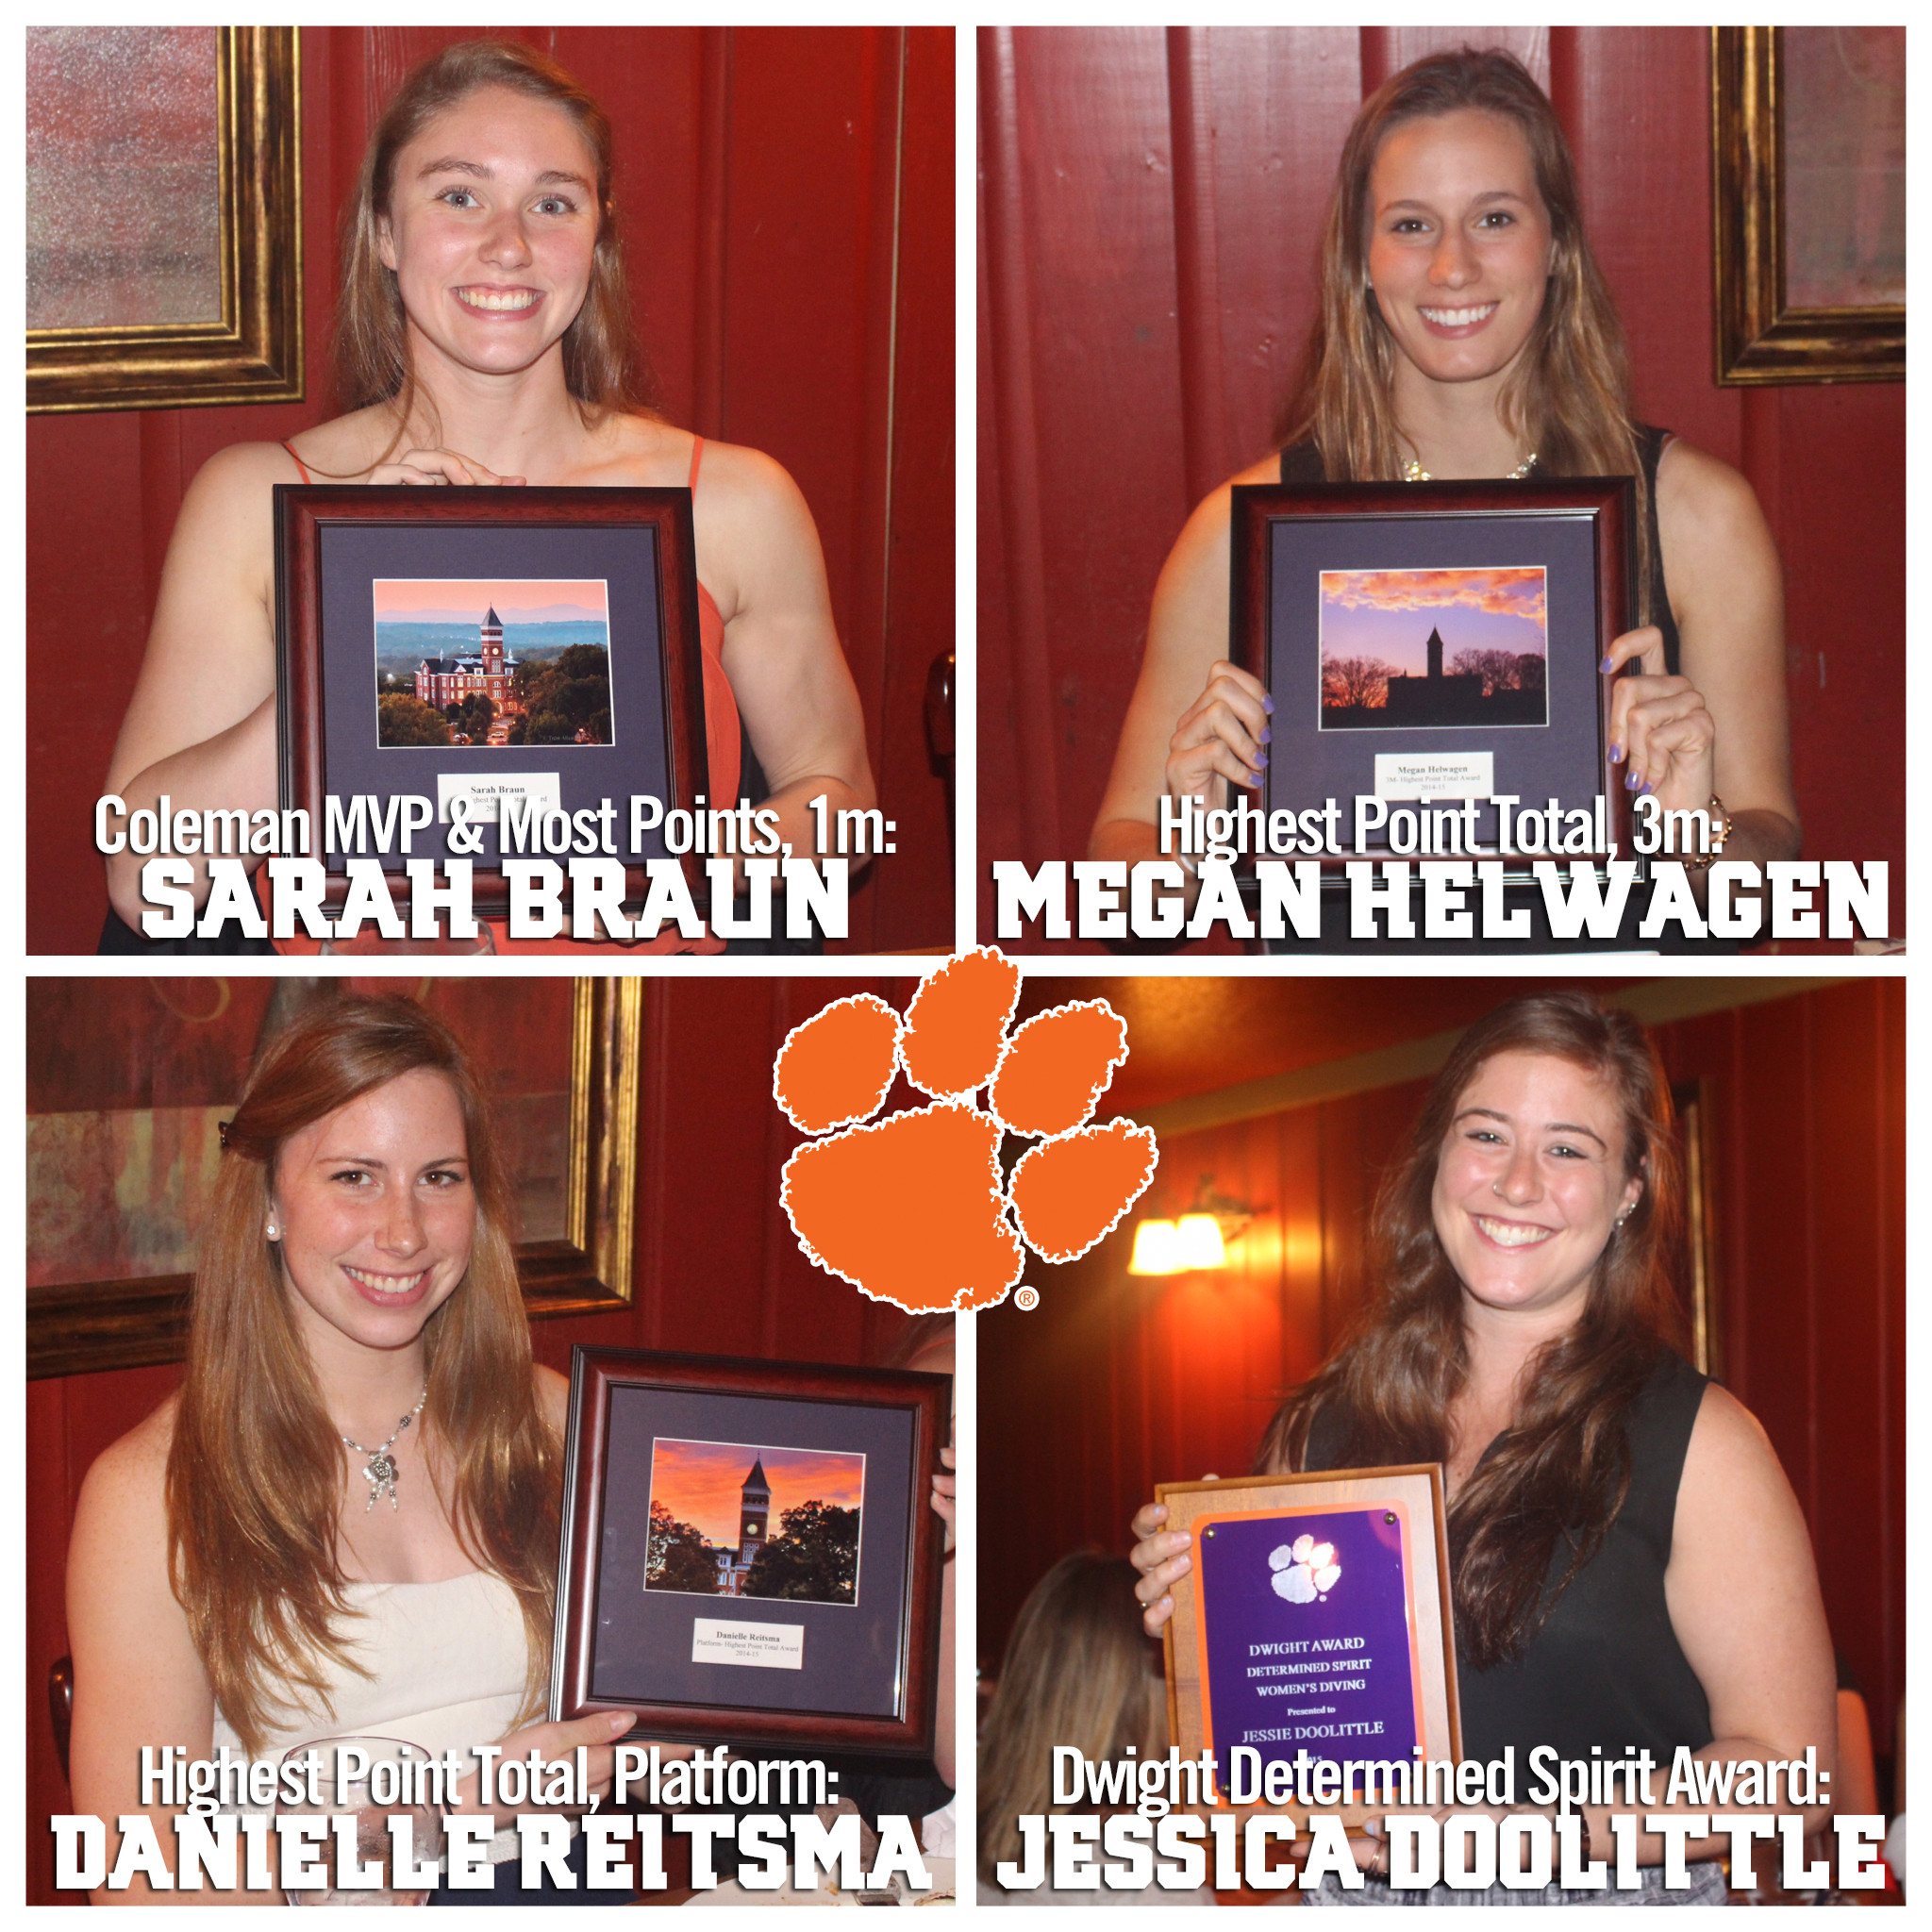 Tigers Hold Annual Postseason Banquet, Announce Award Recipients